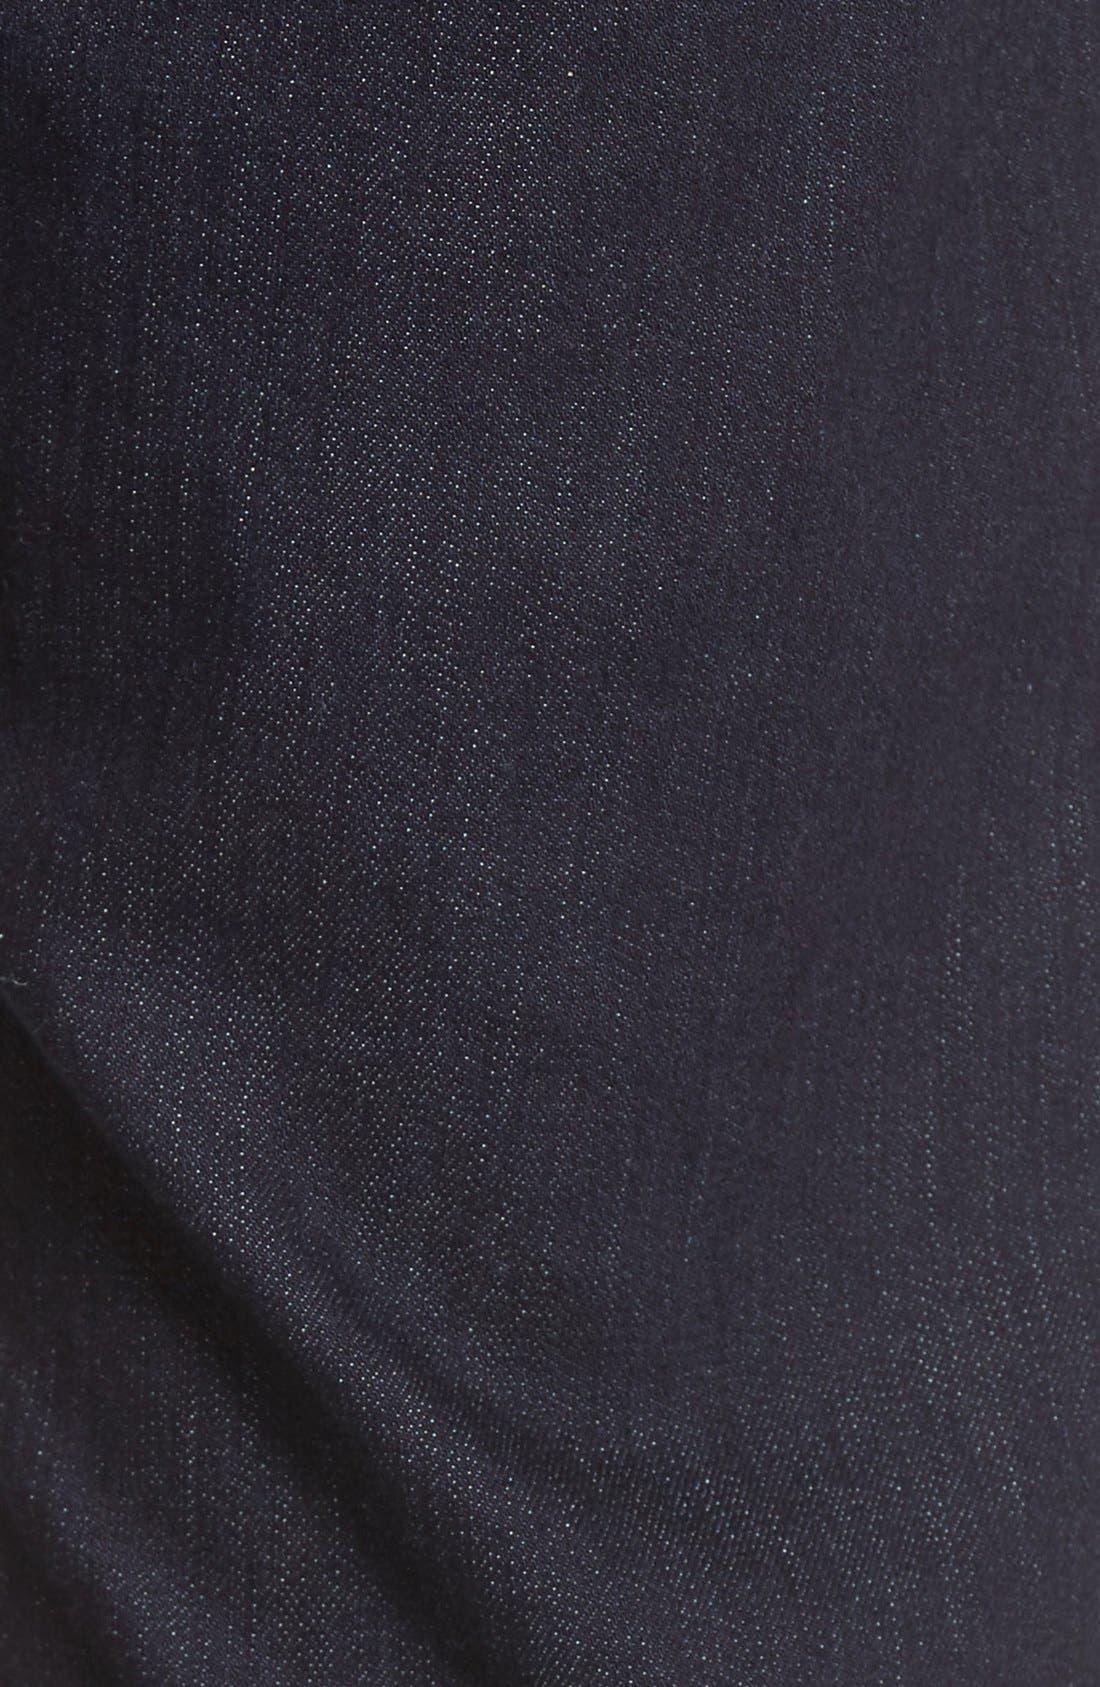 Geno Straight Leg Jeans,                             Alternate thumbnail 5, color,                             2S Body Rinse